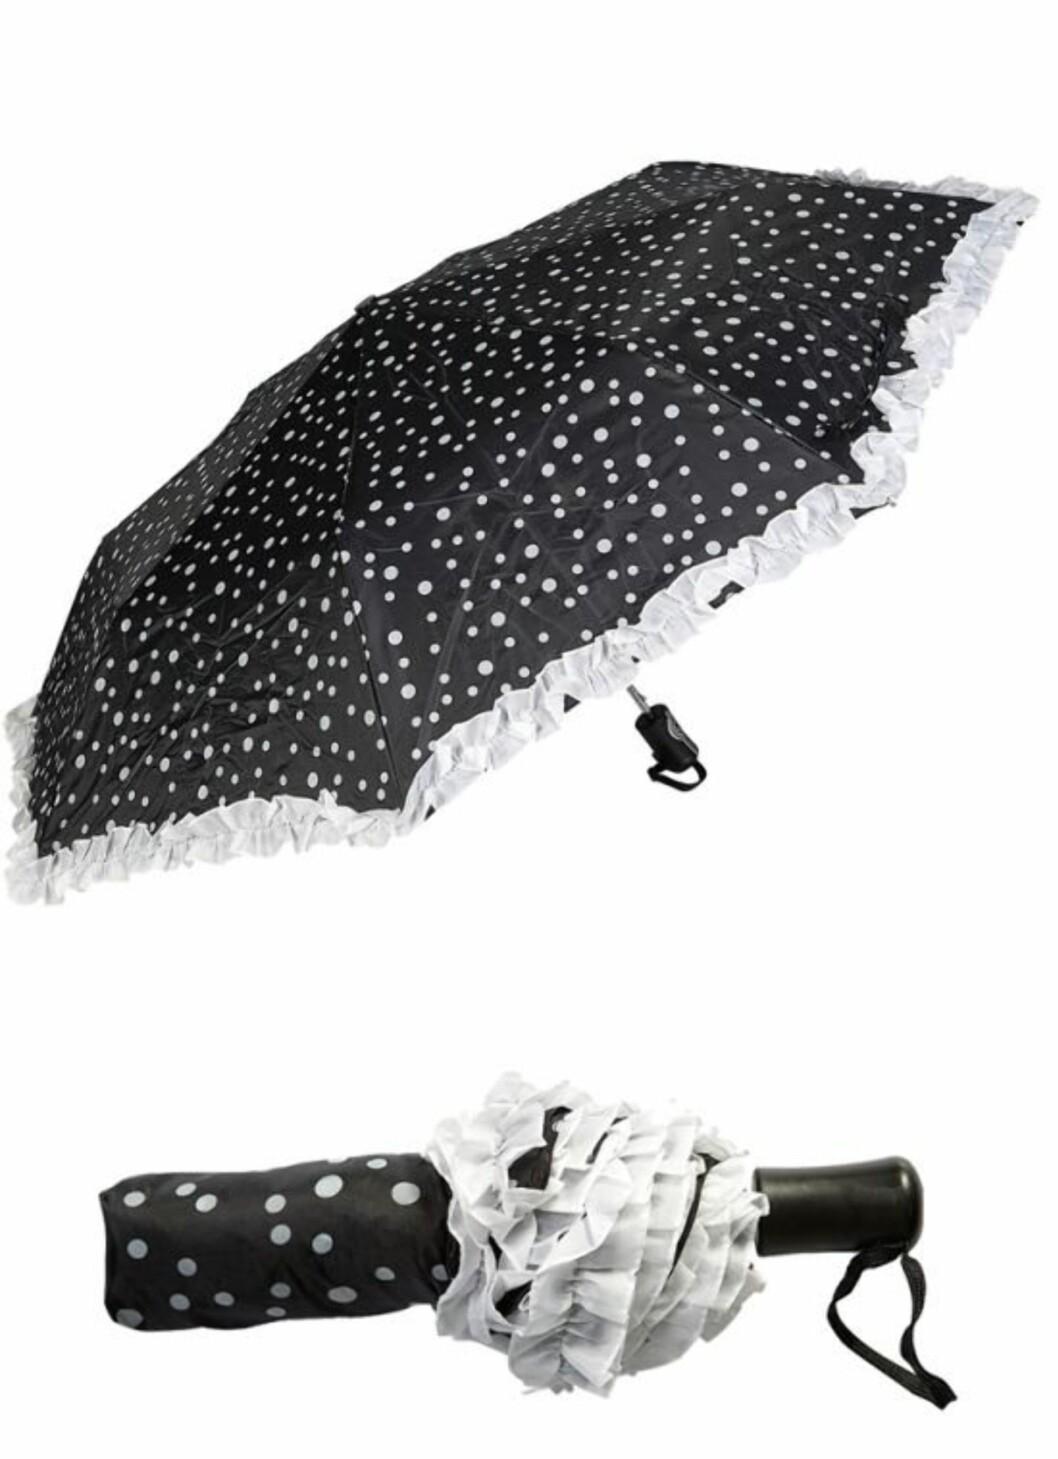 Snuppete paraply fra Spar Kjøp (kr.39,50/sparkjop.no). Foto: Produsenten